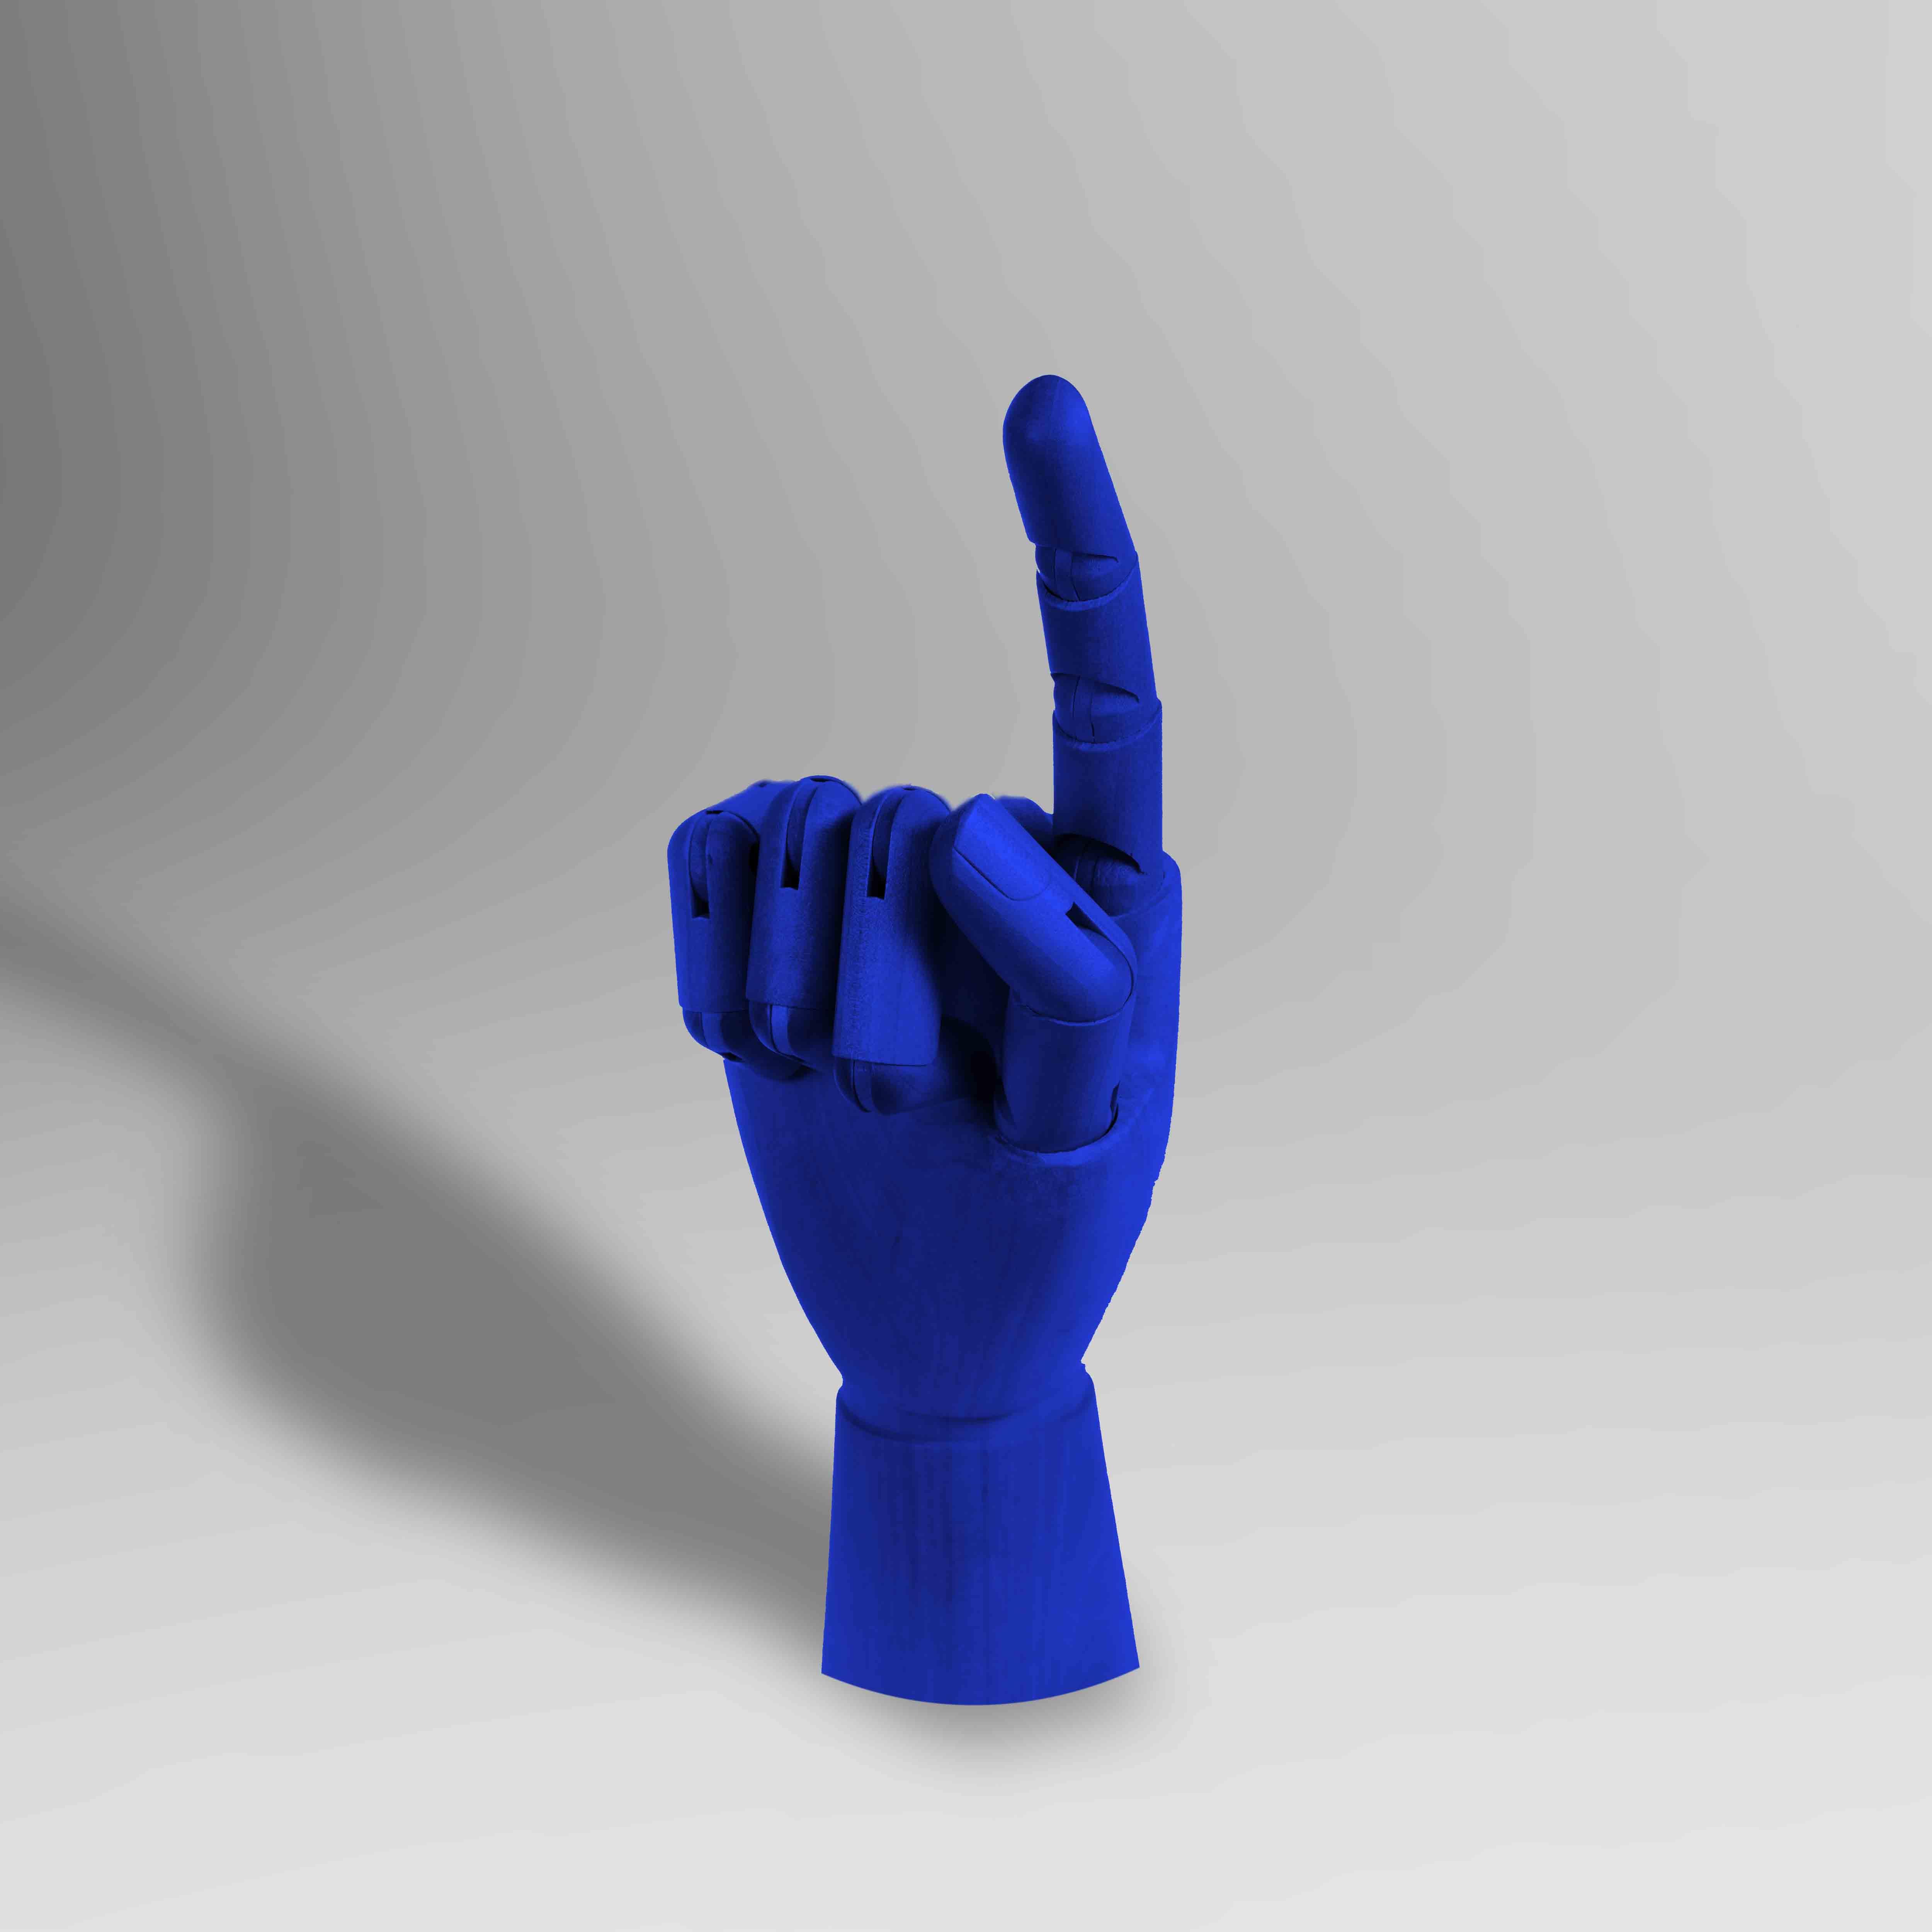 020 BLUE ARTICULATED HAND v02